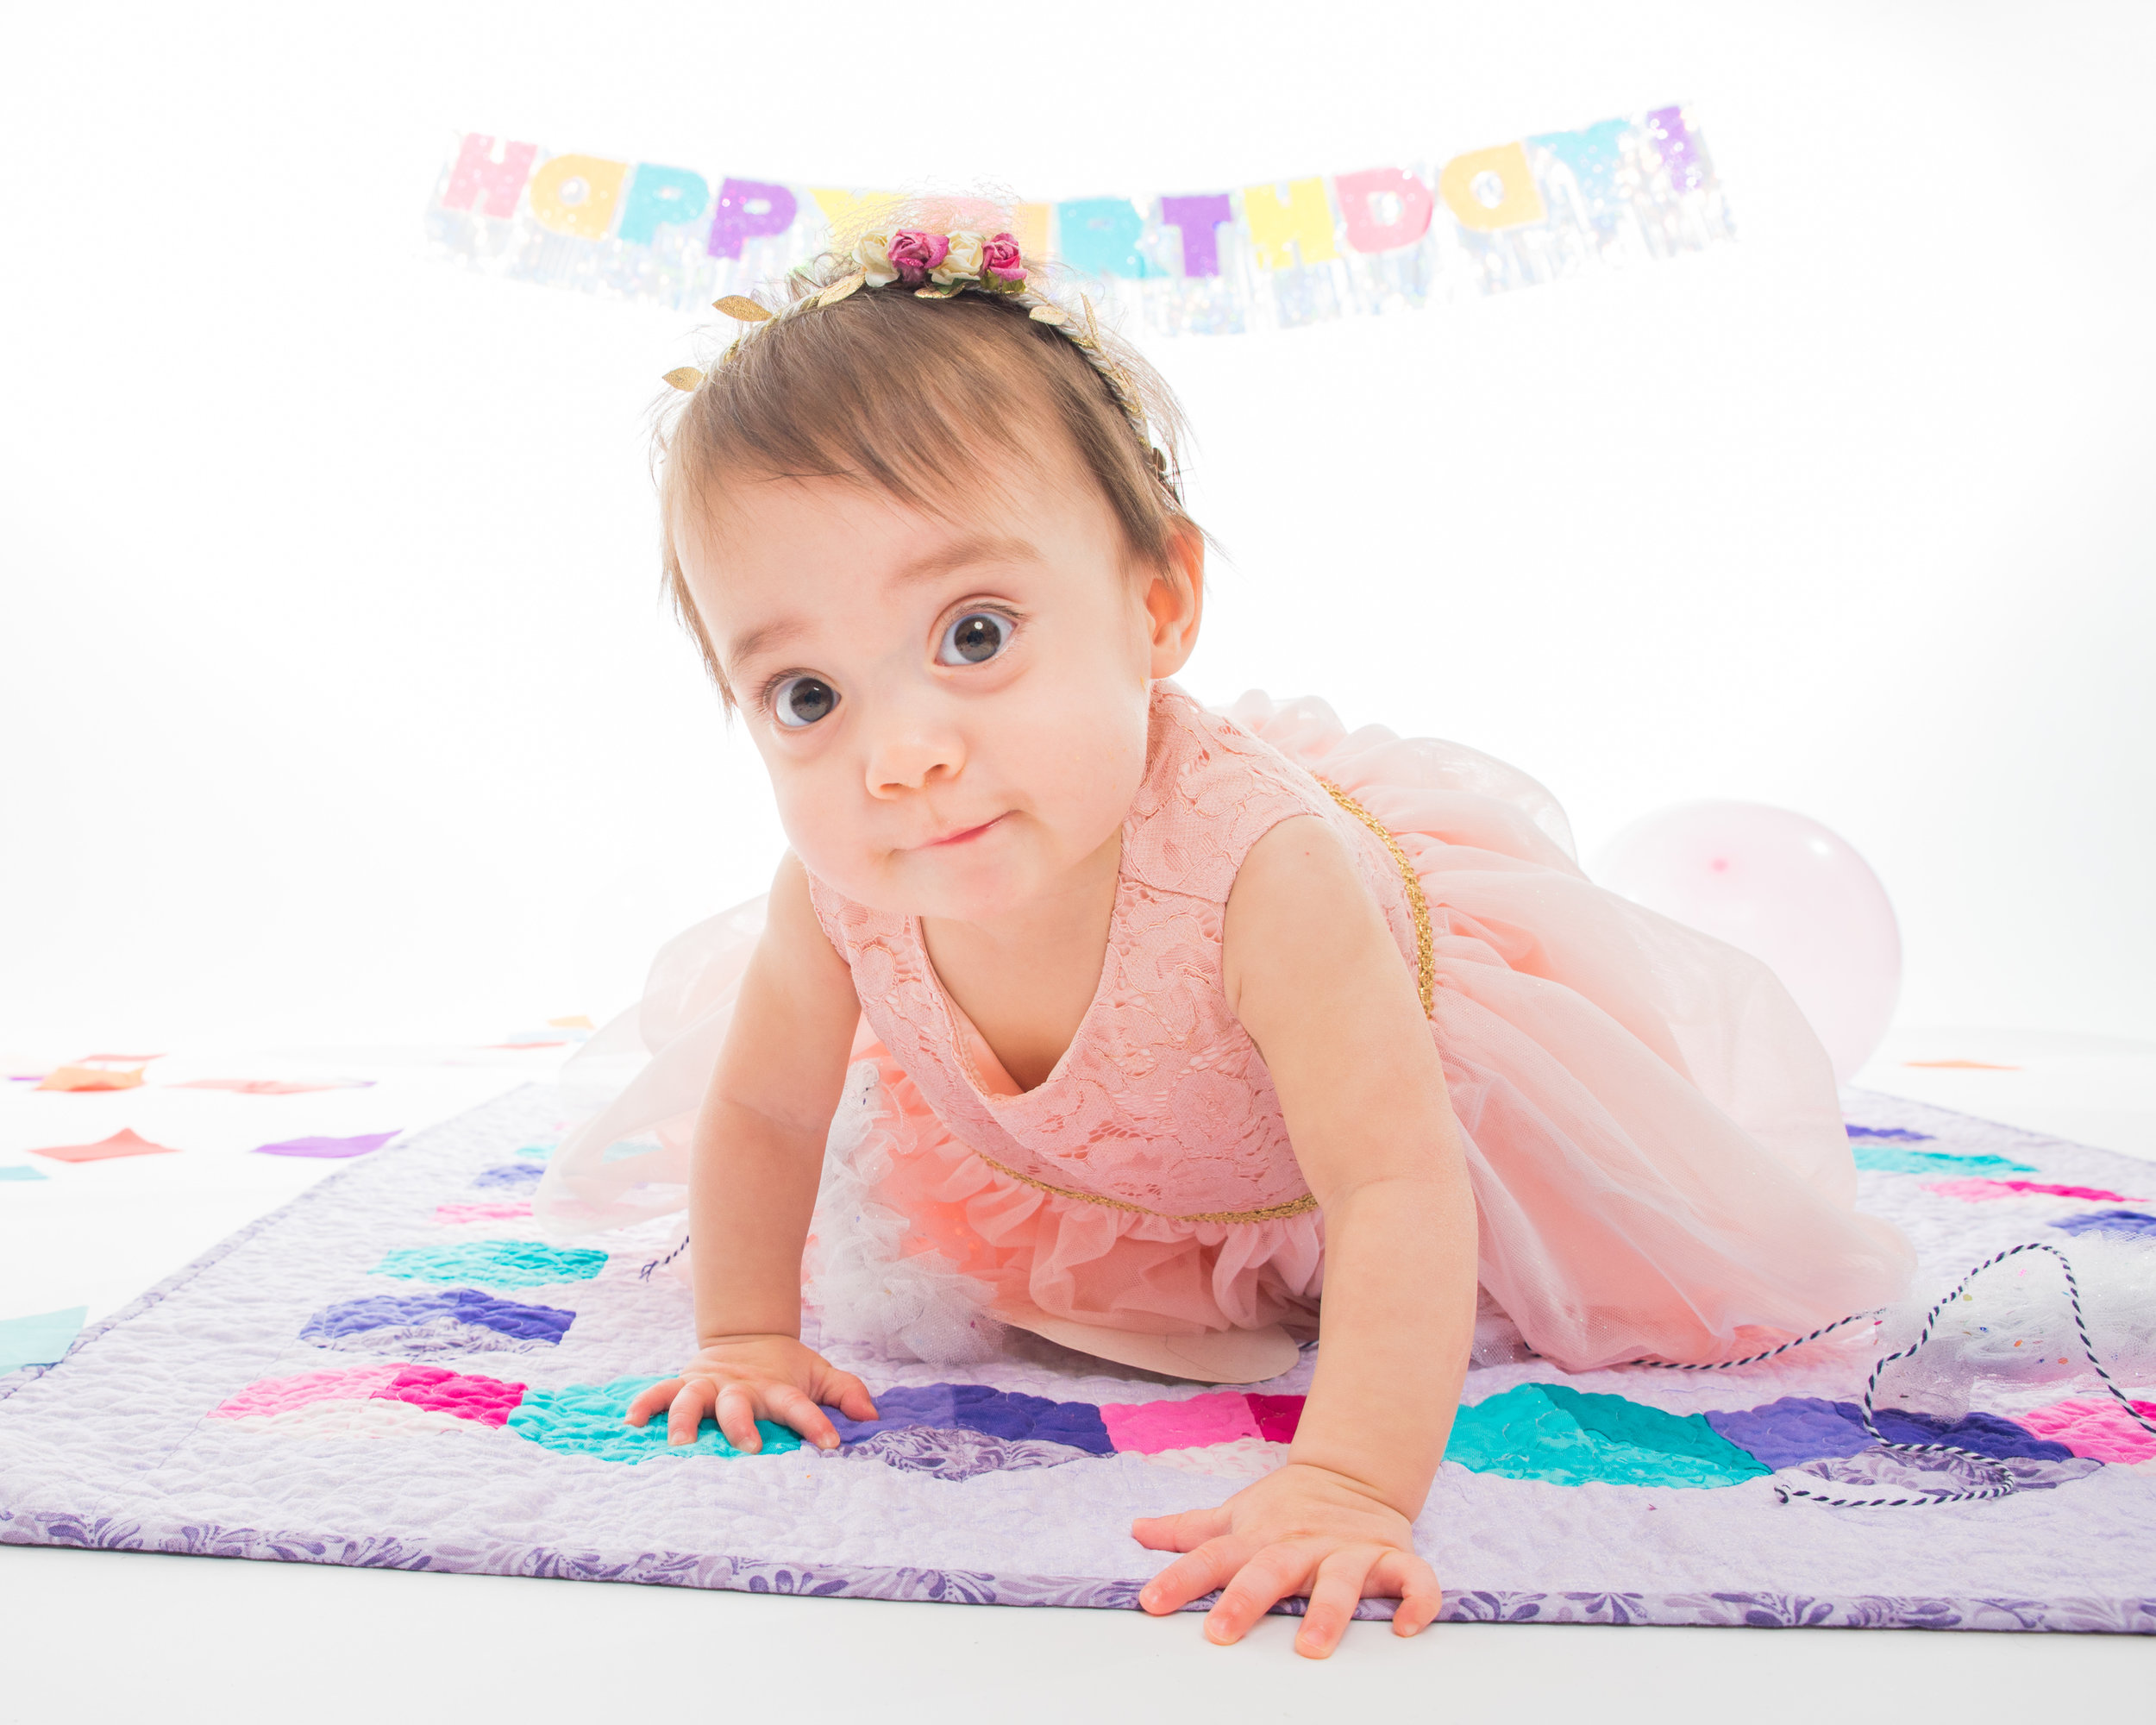 2018_February_04-Veronica_Sullivan_One_Year_Baby_Pics-44854-Edit.jpg